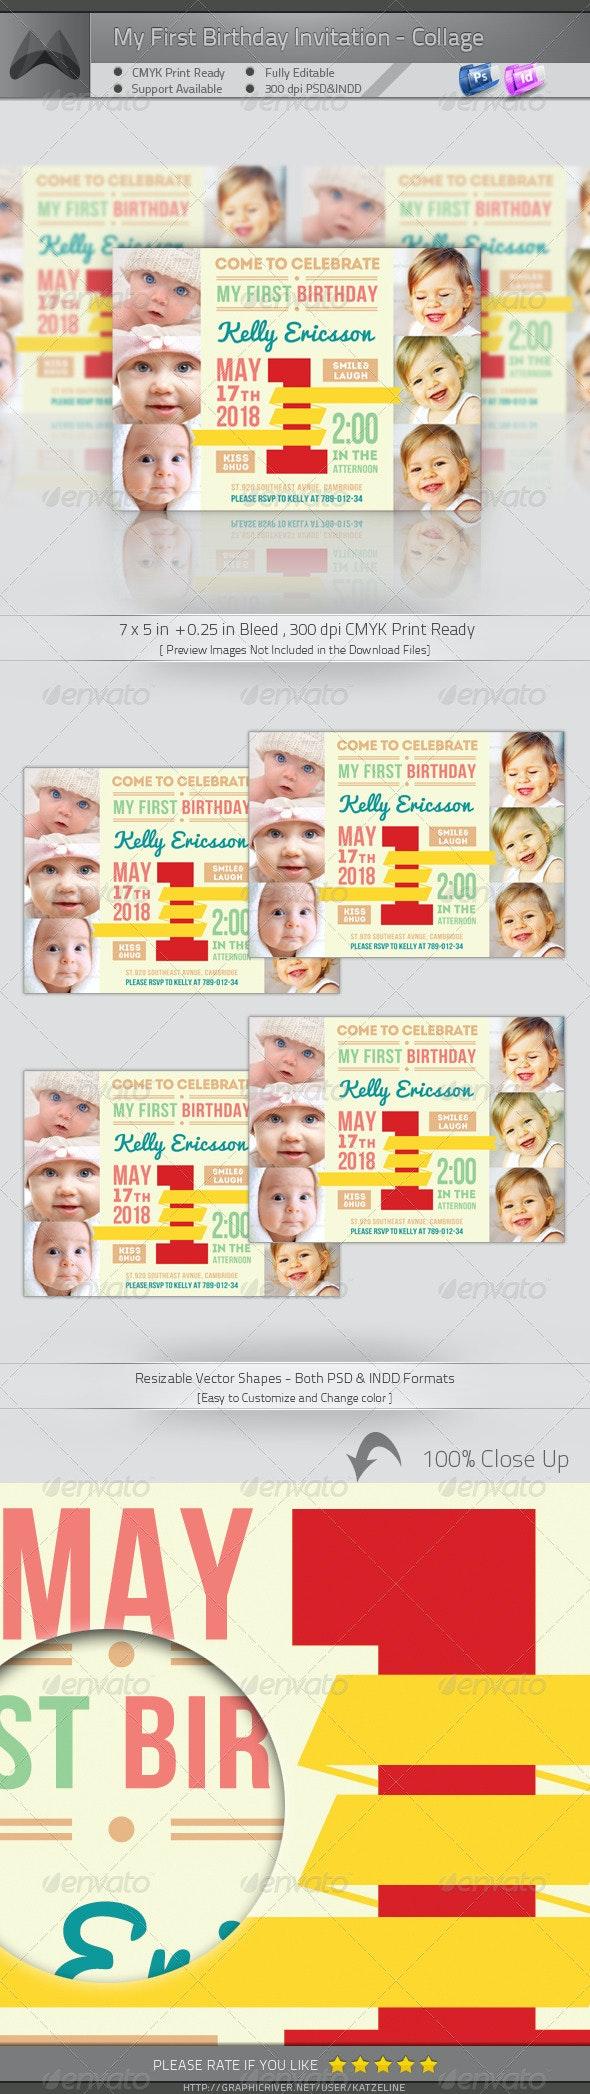 My First Birthday Invitation - Big One Collage - Birthday Greeting Cards